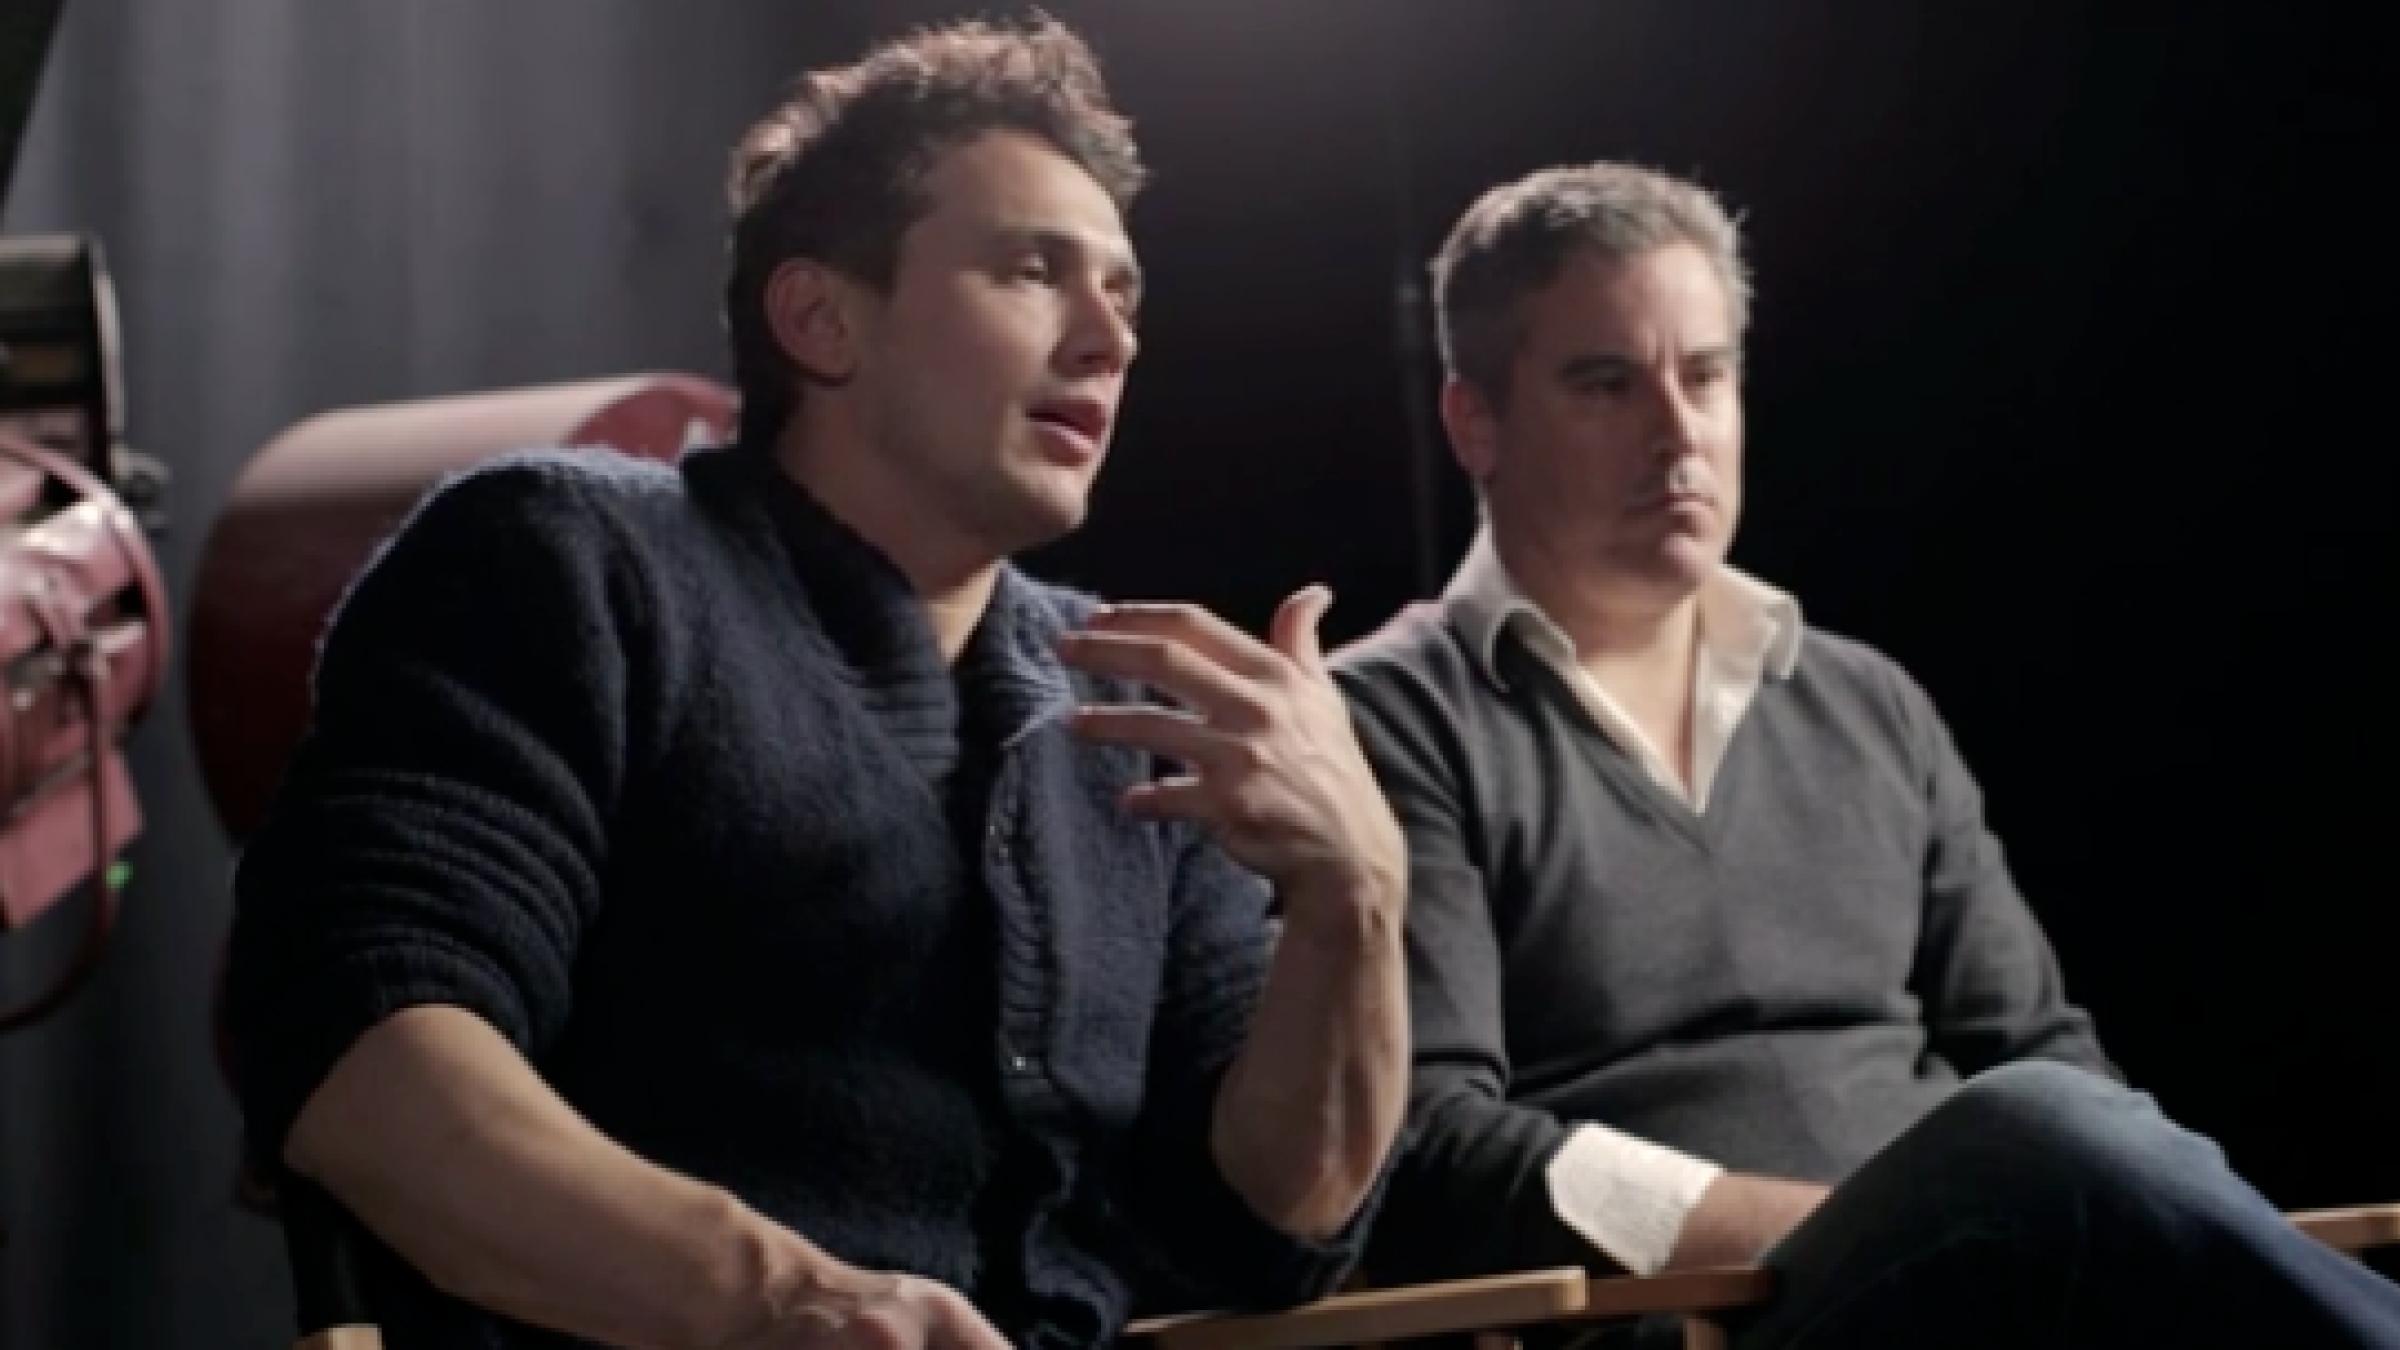 James-Franco-screenwriting